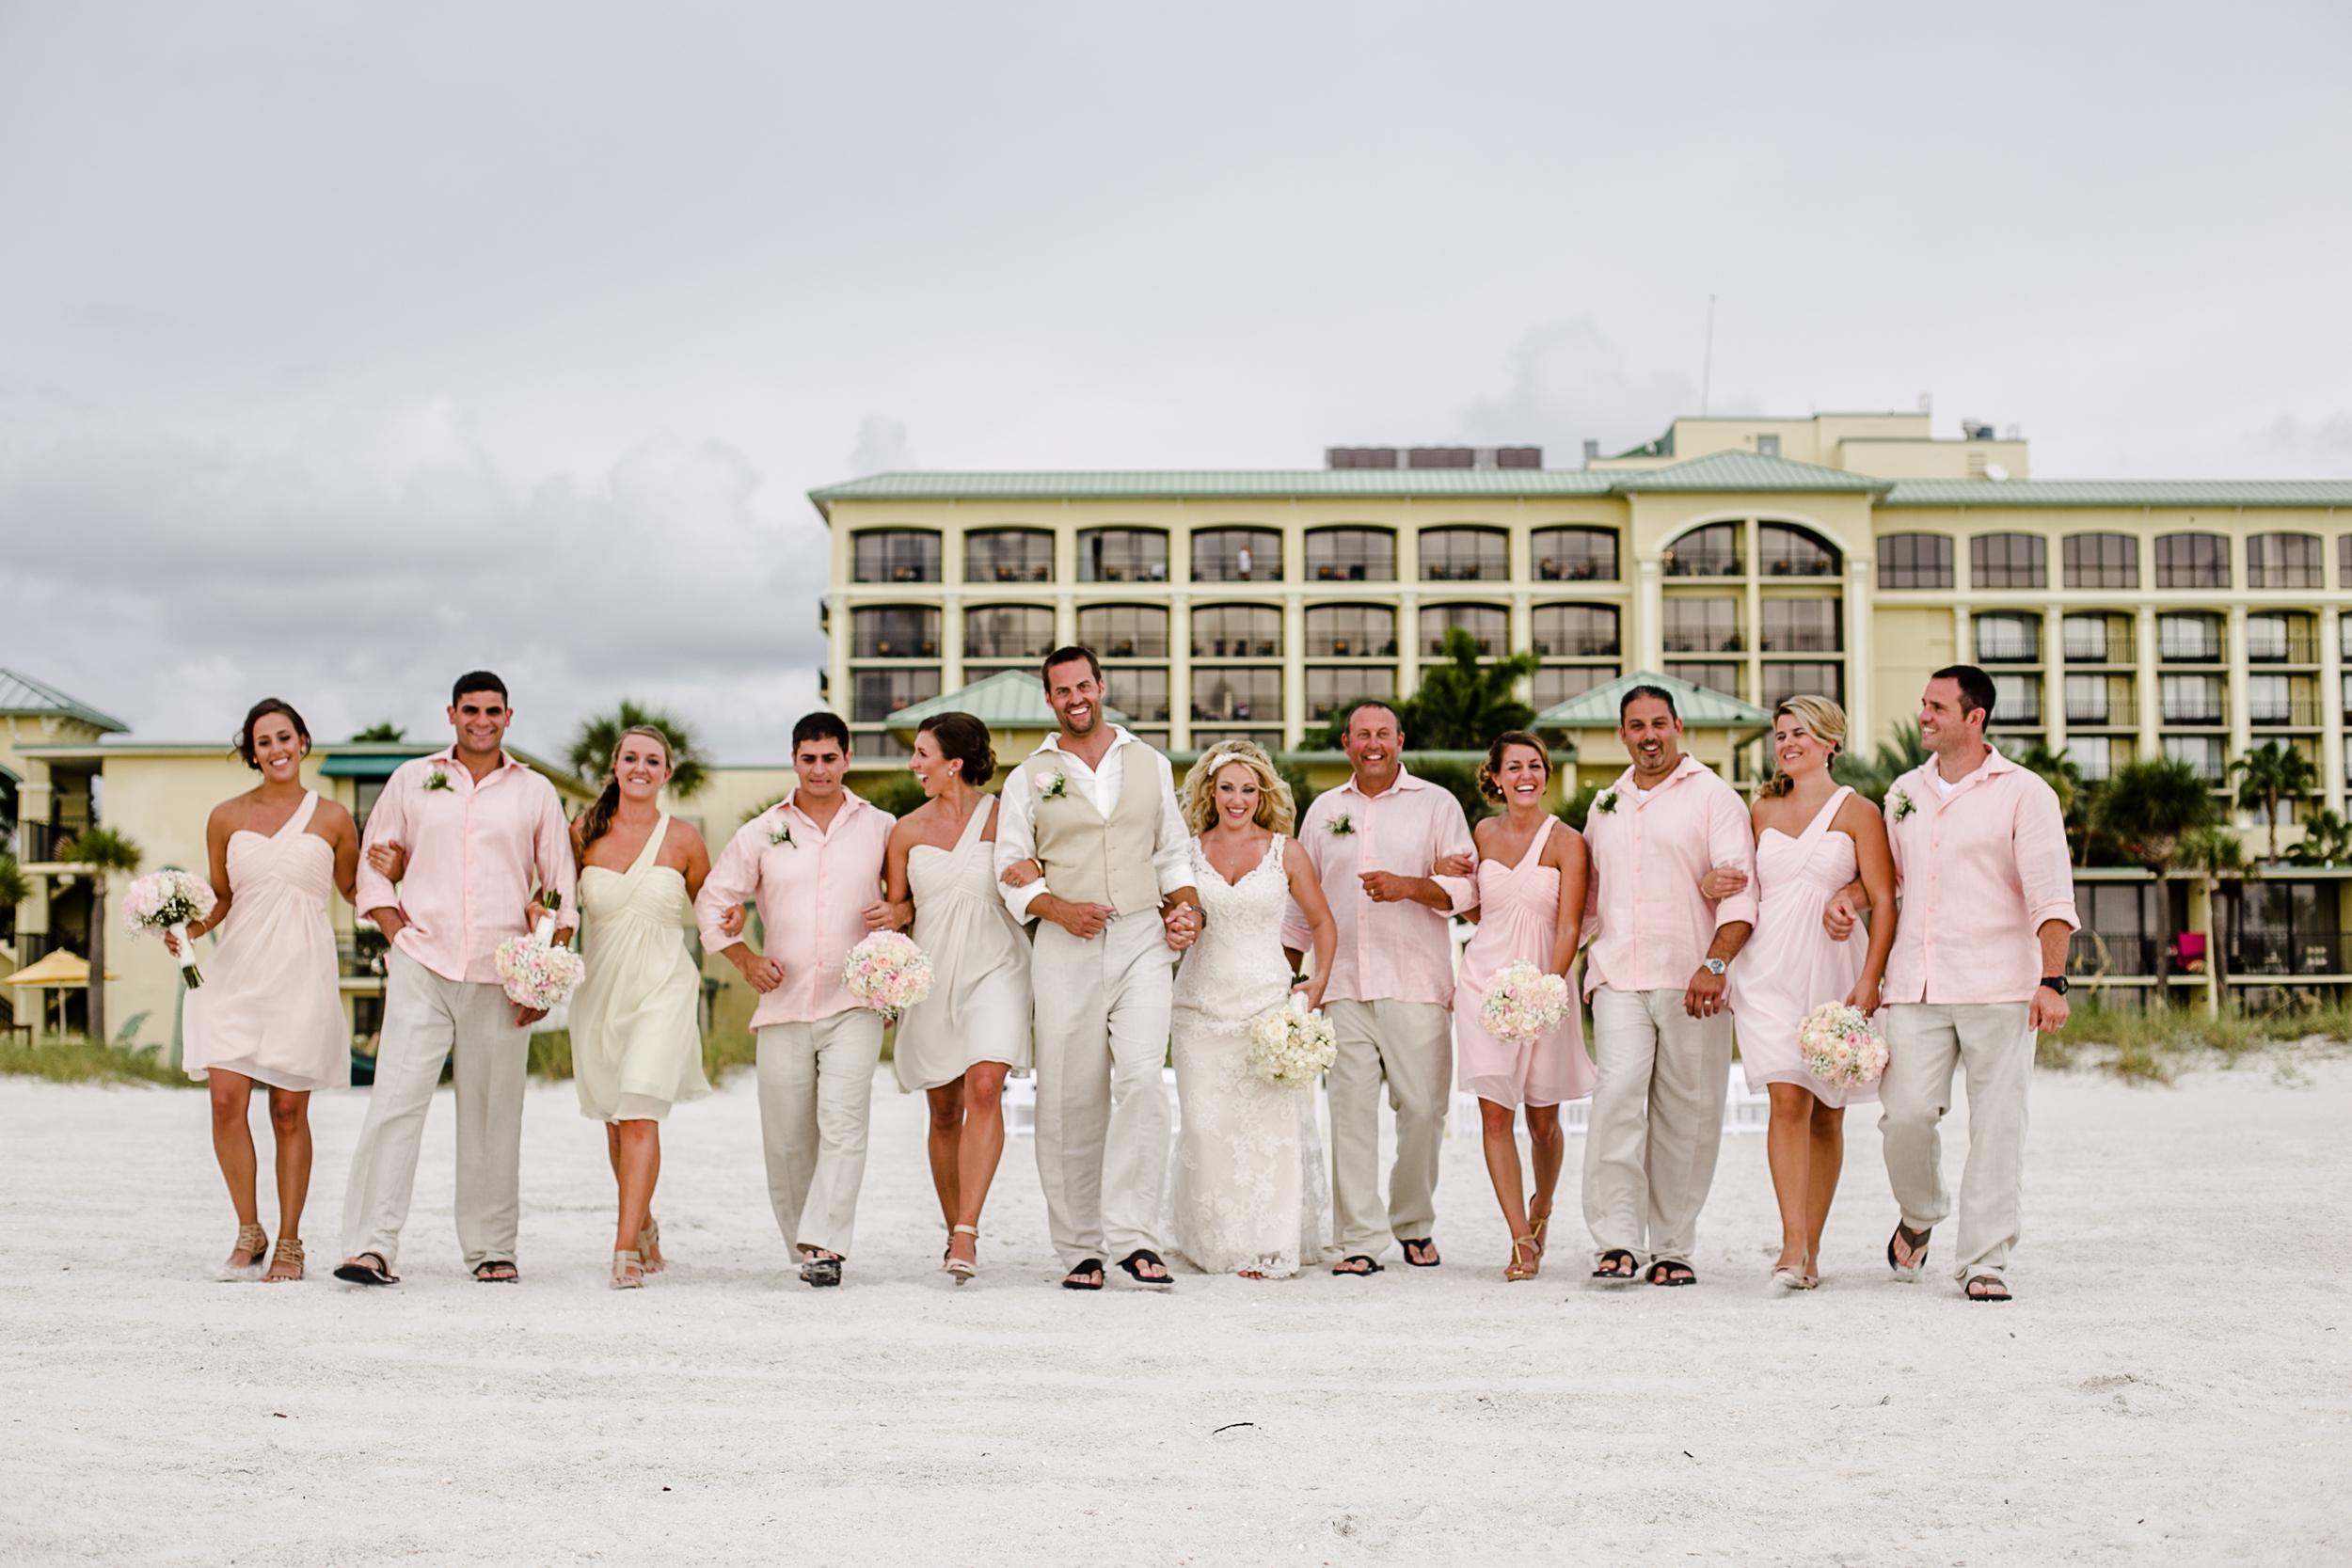 Harris wedding (37 of 72).JPG